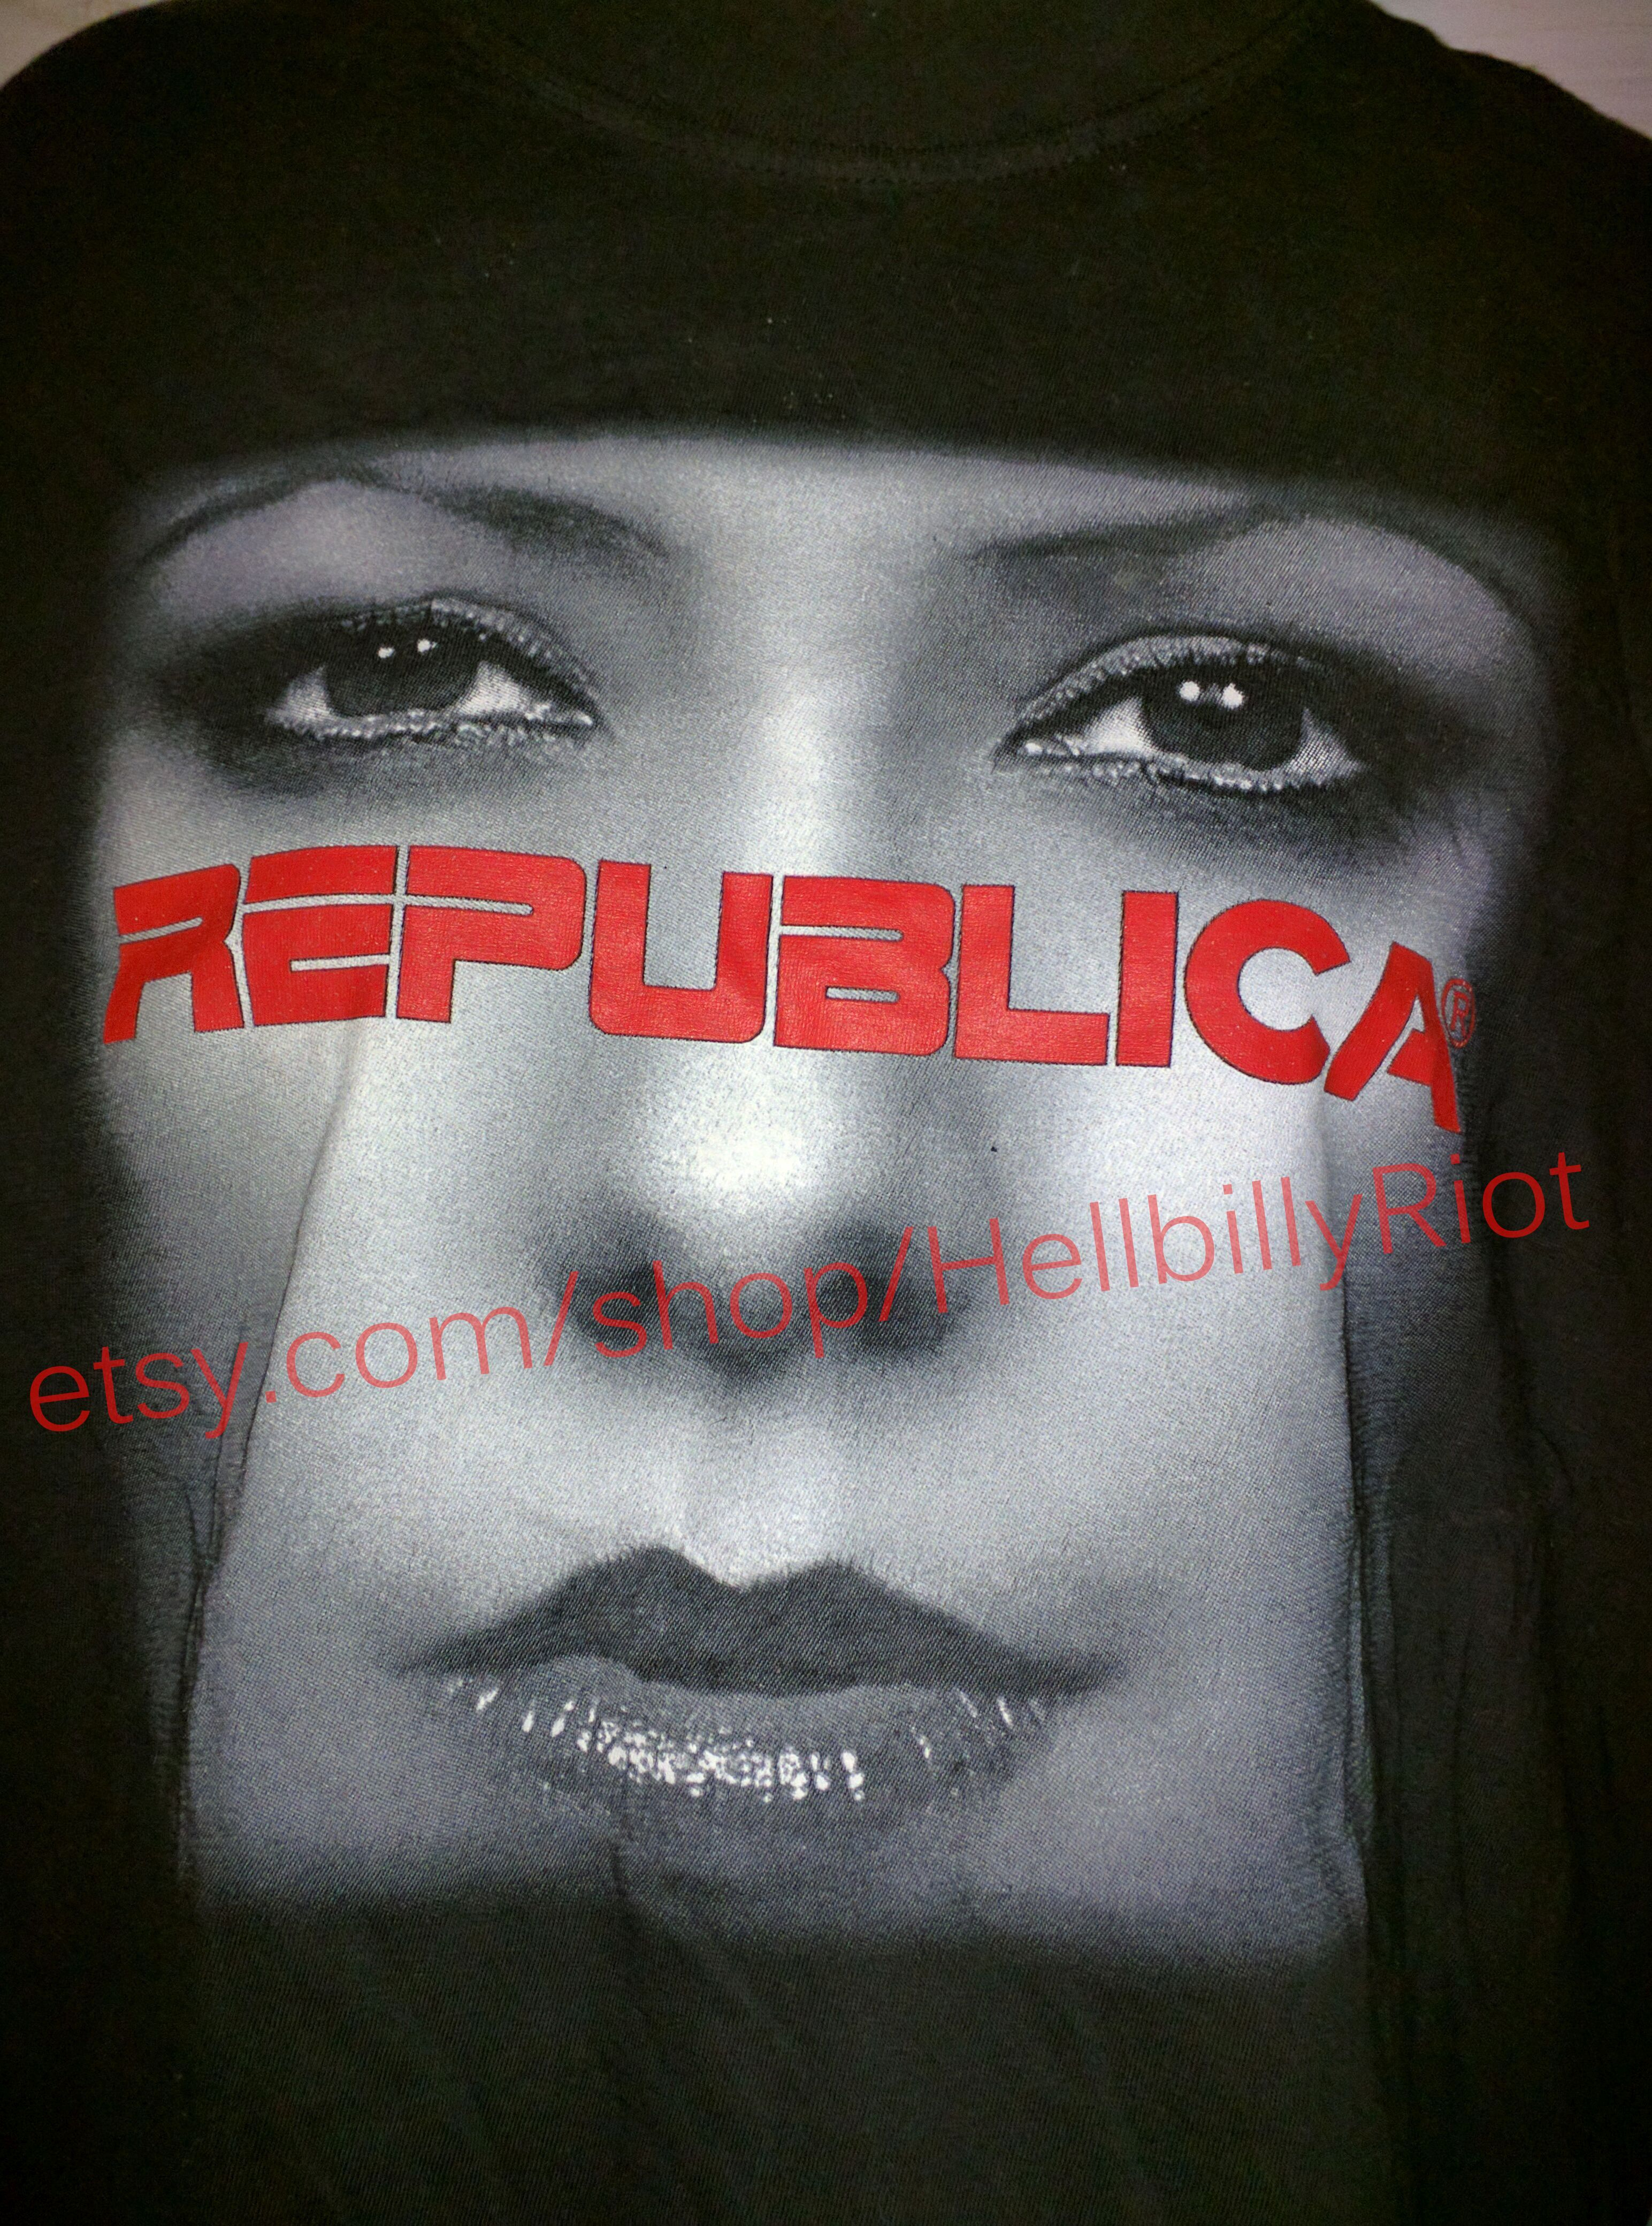 Republica British Europop 90s Concert Vintage T Shirt Britpop Rare Hardcore Hxc New York Music Punk Straight Edge Xxx Straightedge